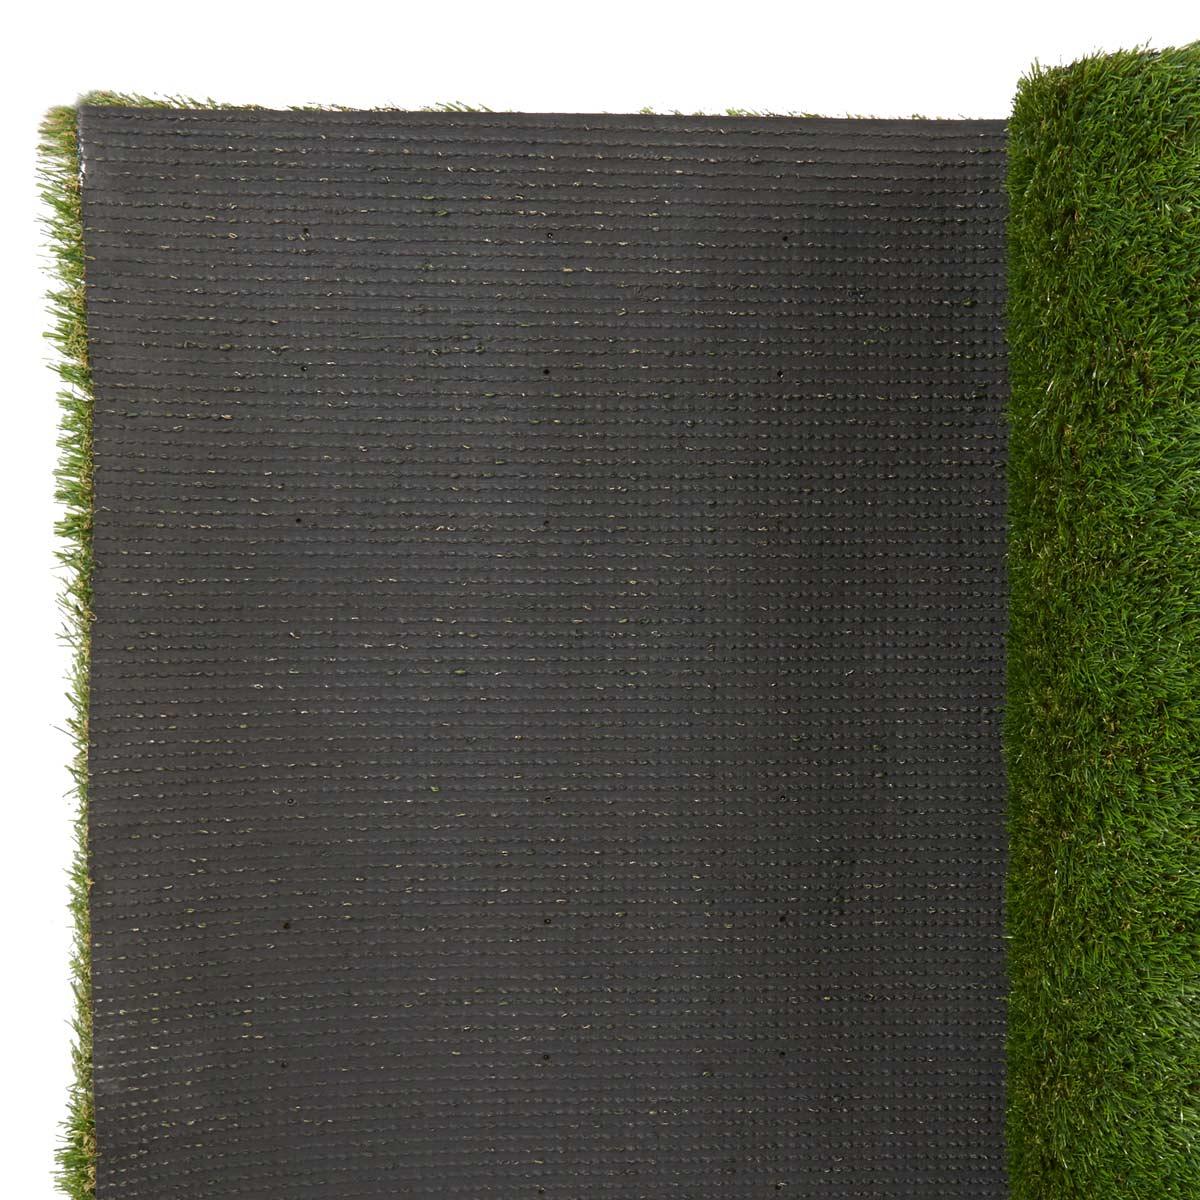 herbe synthtique pas cher gazon synthetique pas cher aix en provence herbe synthtique pas cher. Black Bedroom Furniture Sets. Home Design Ideas